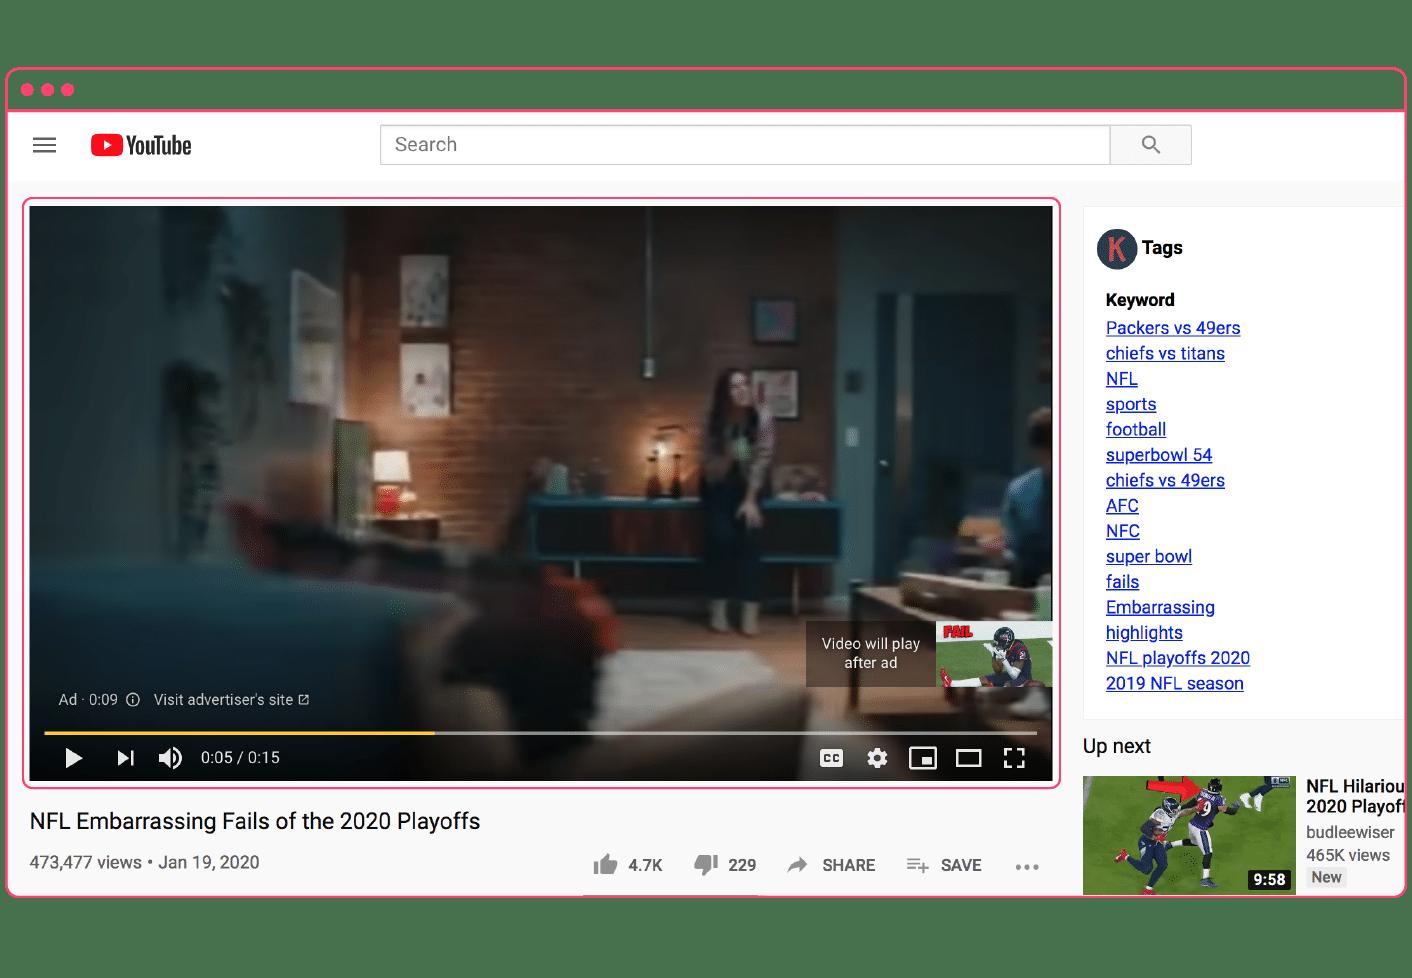 YouTube Pre-roll ad